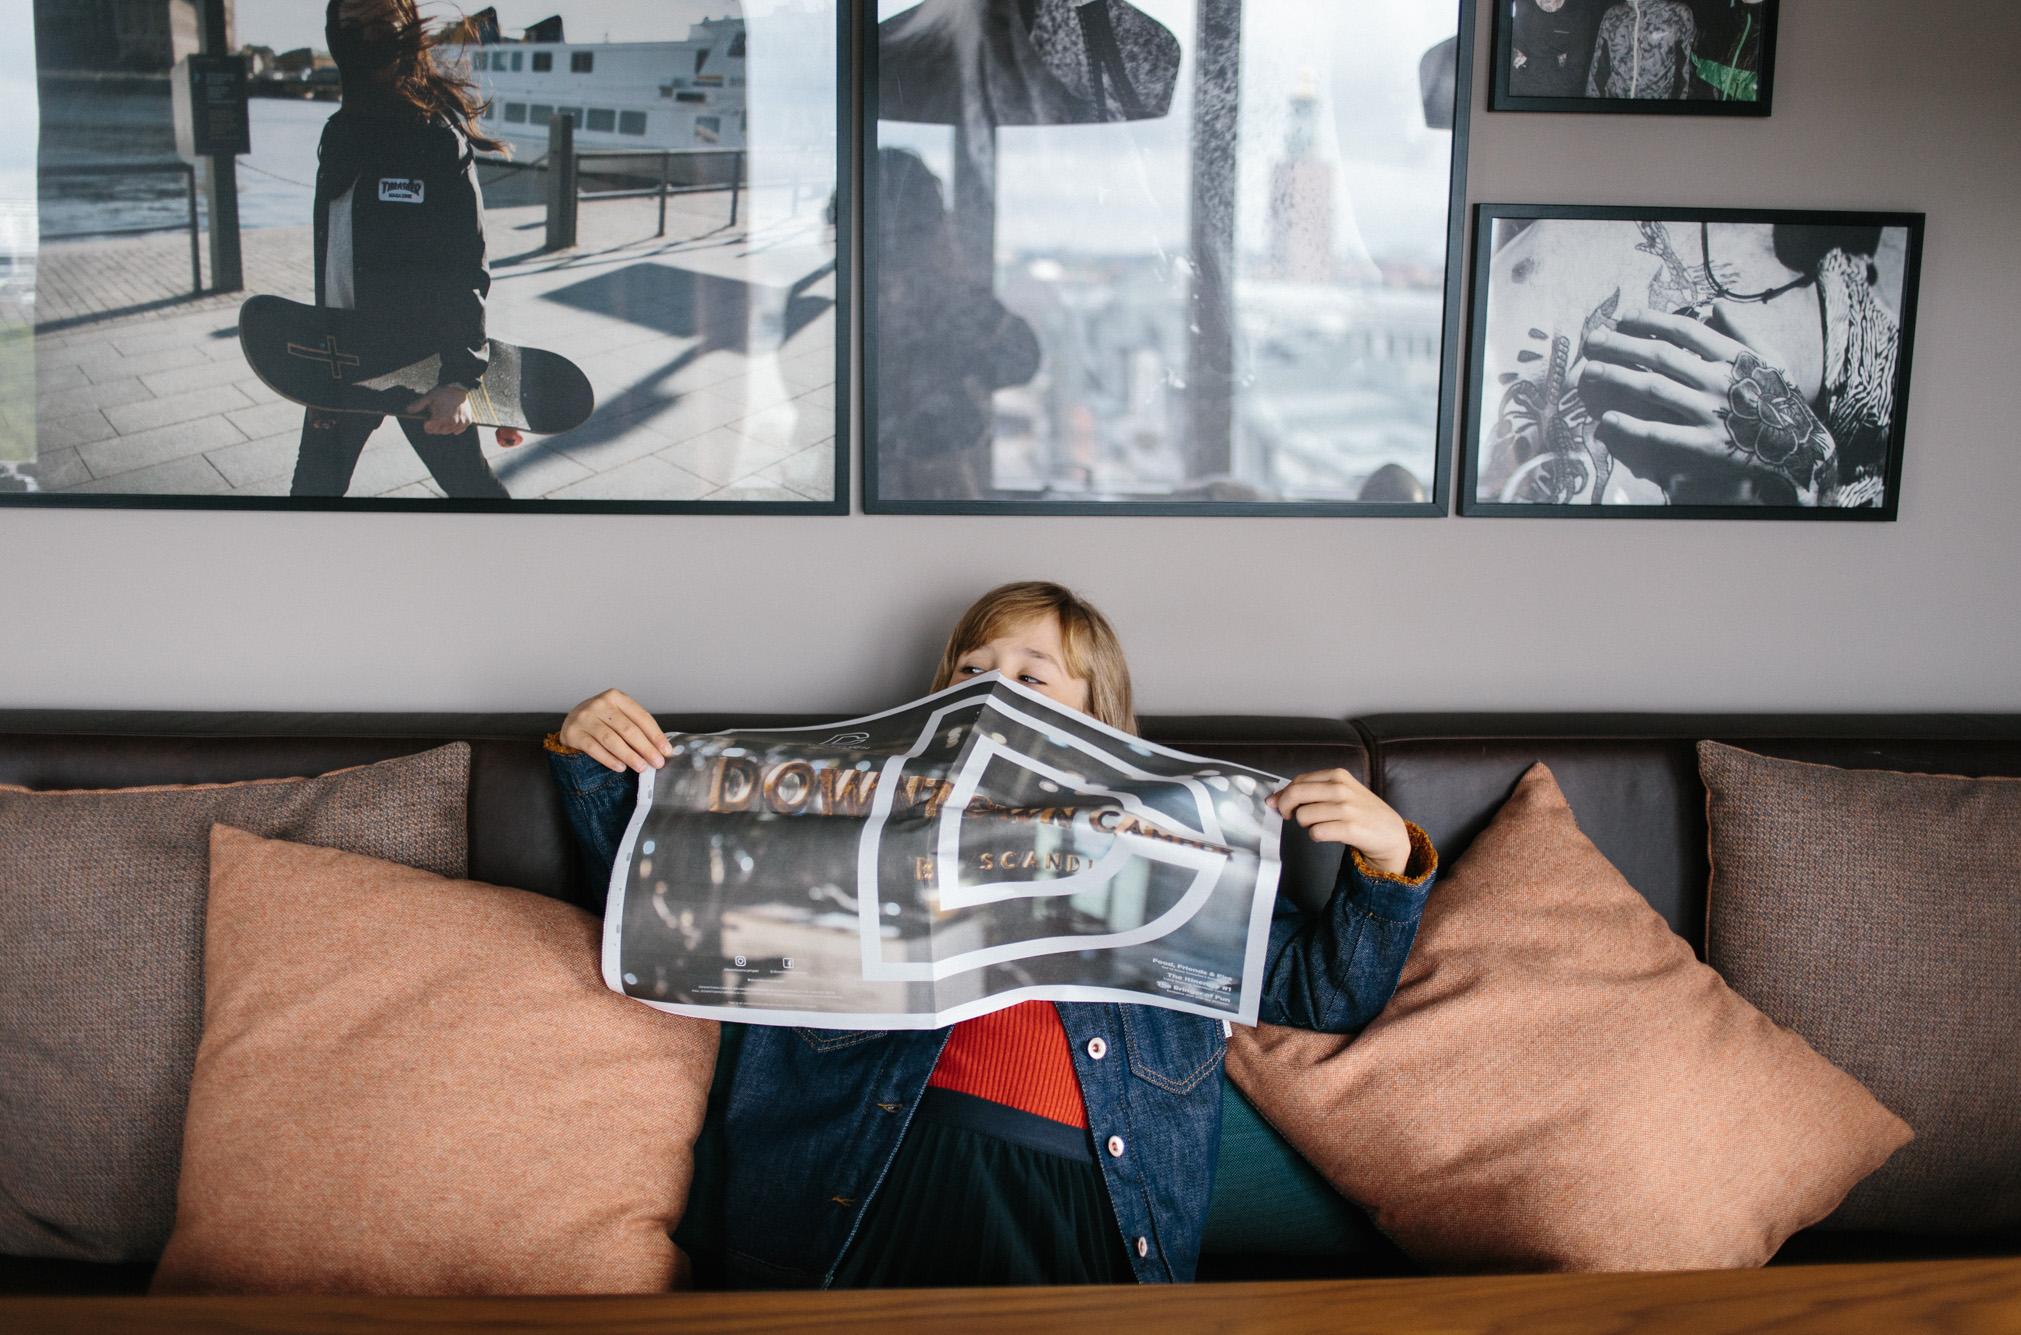 stockholm-kids-cityguide-conbotasdeagua-2.jpg